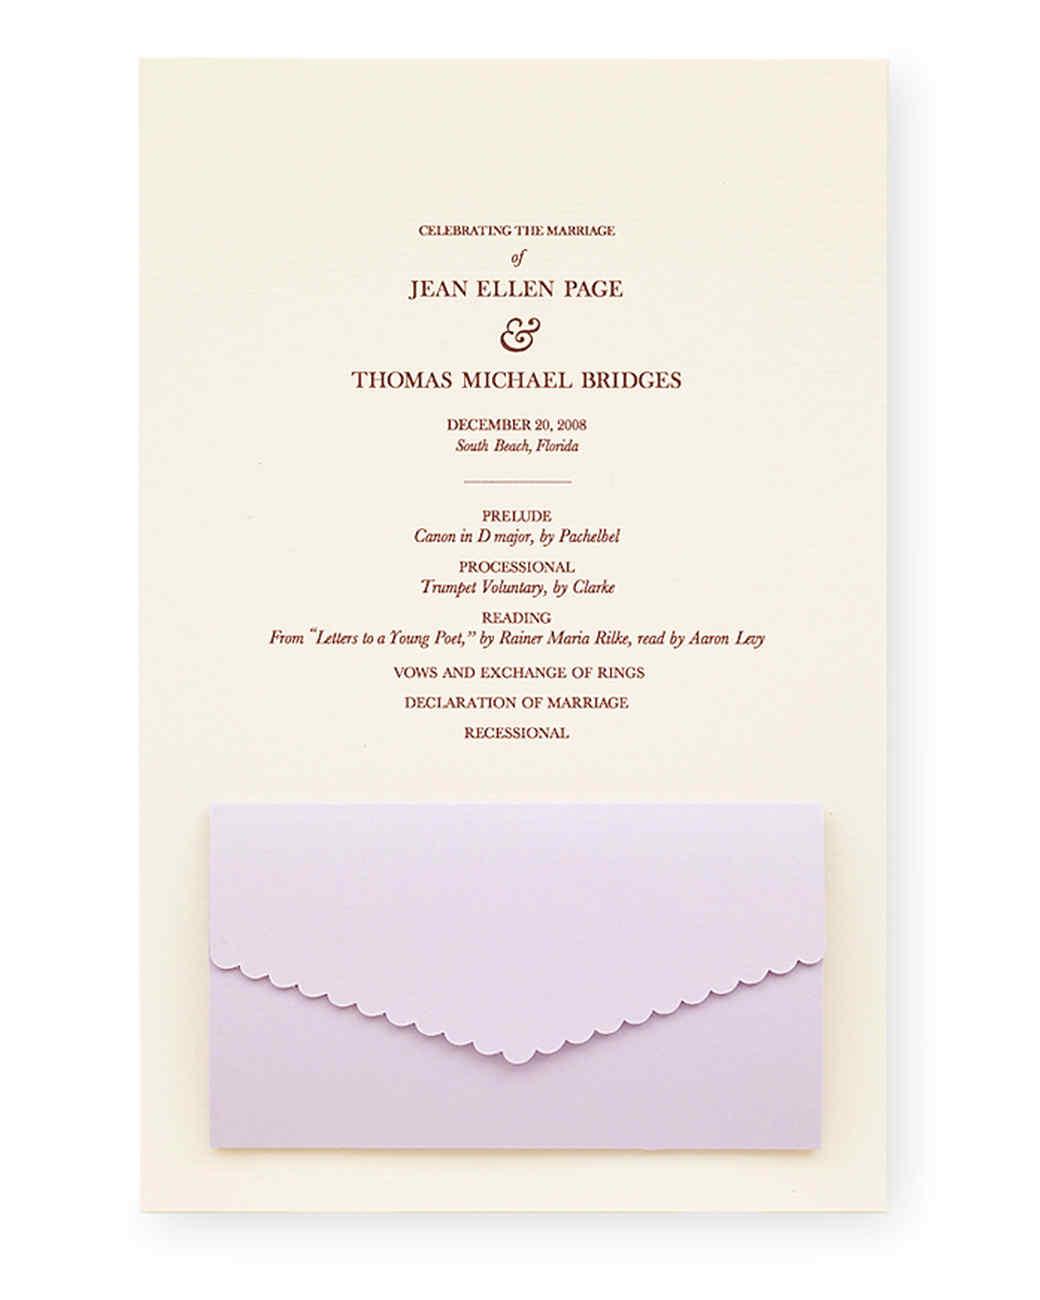 Unique Wedding Ceremony Programs Martha Stewart Weddings - oukas.info